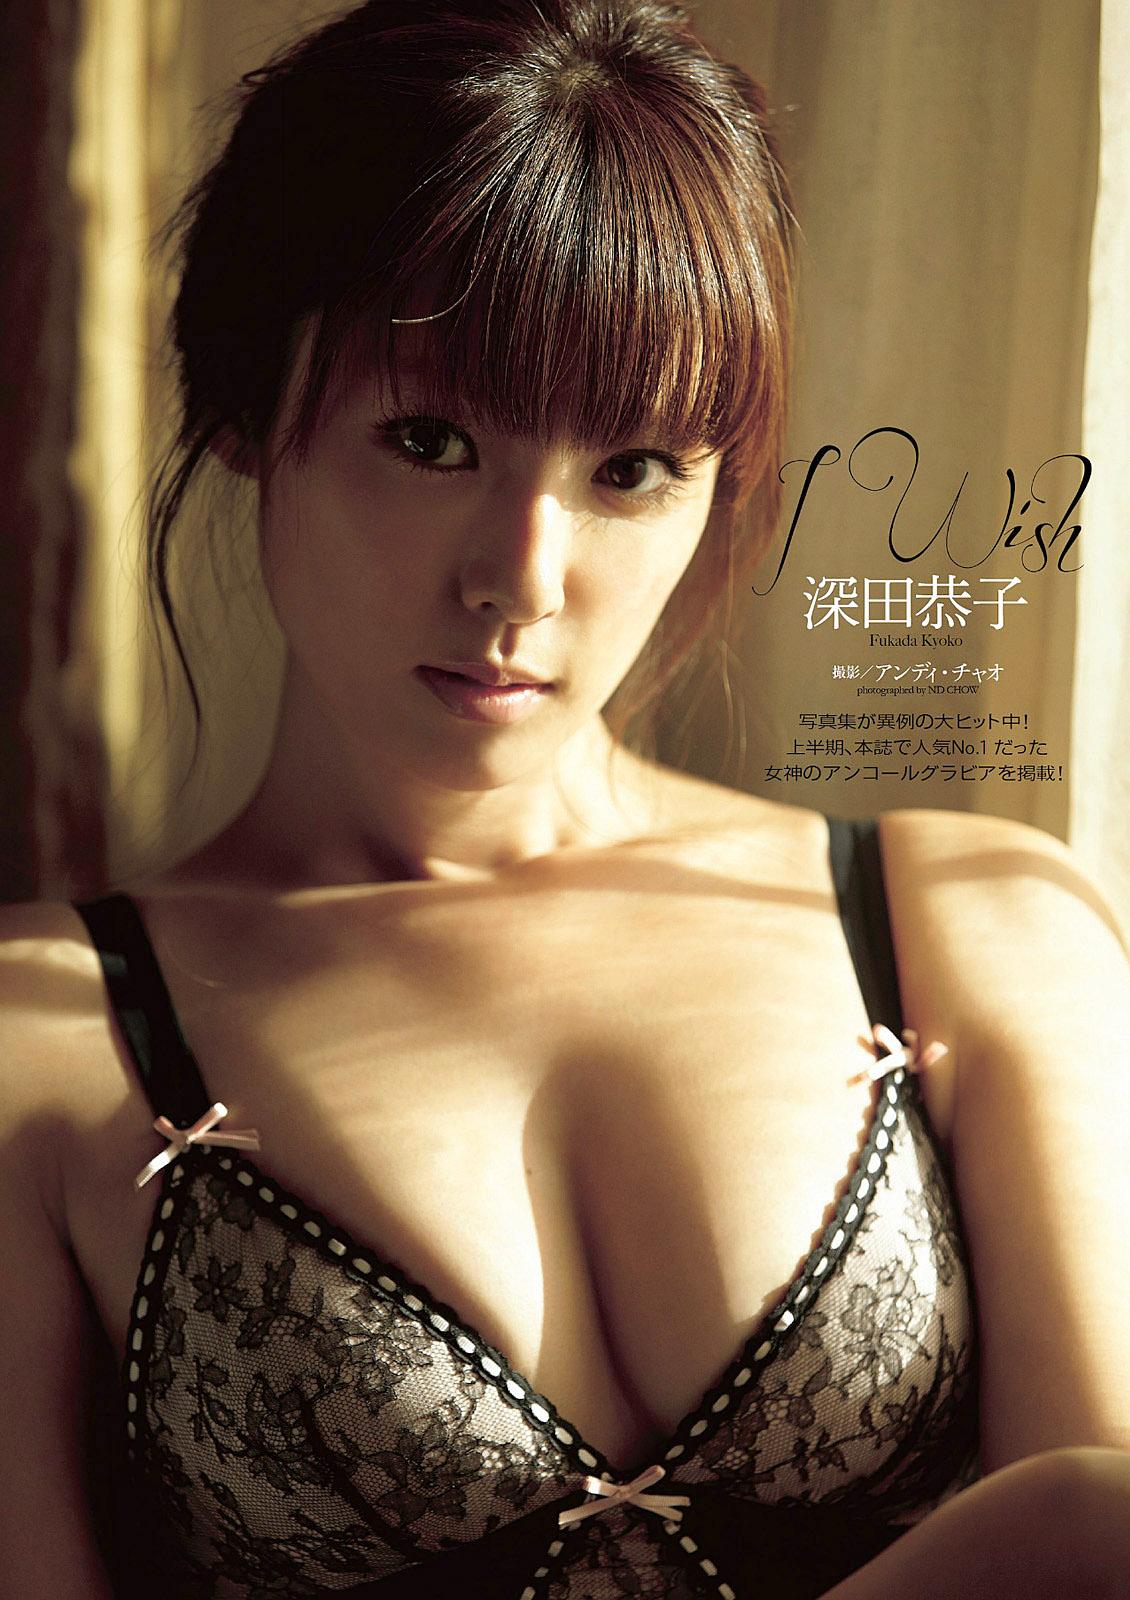 Kyoko Fukada WPB 140519 01.jpg